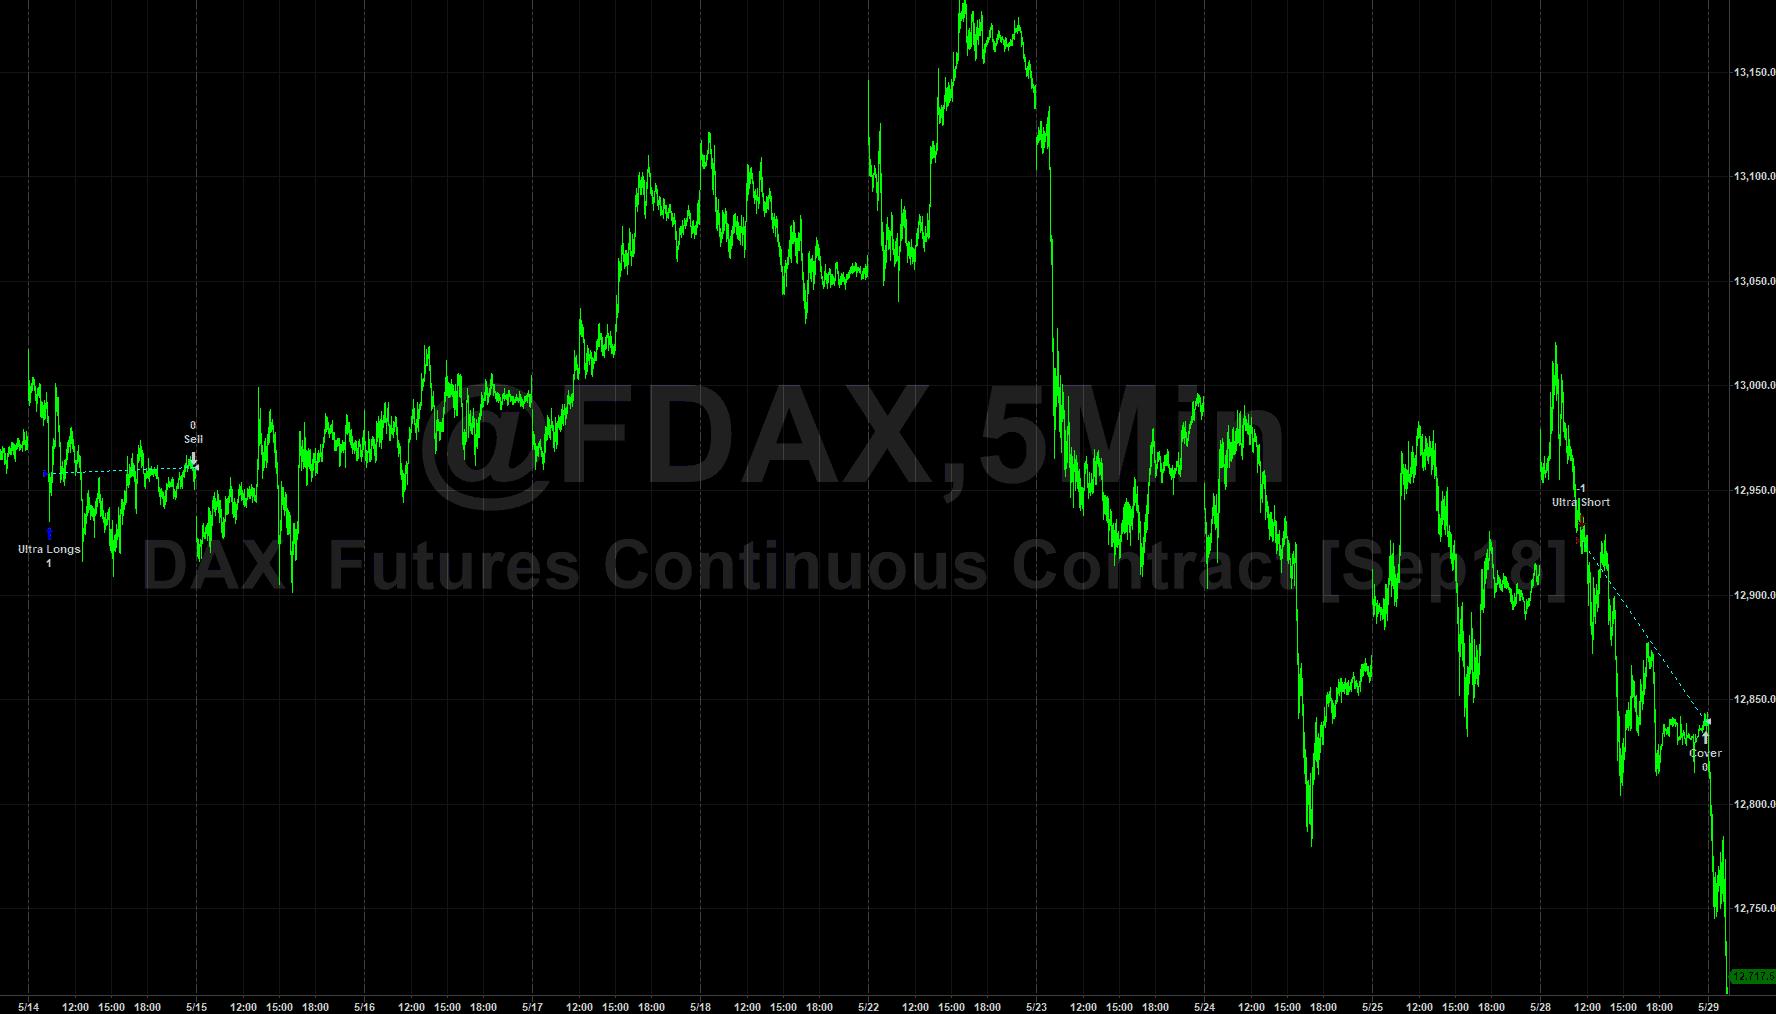 Daytrading Dax